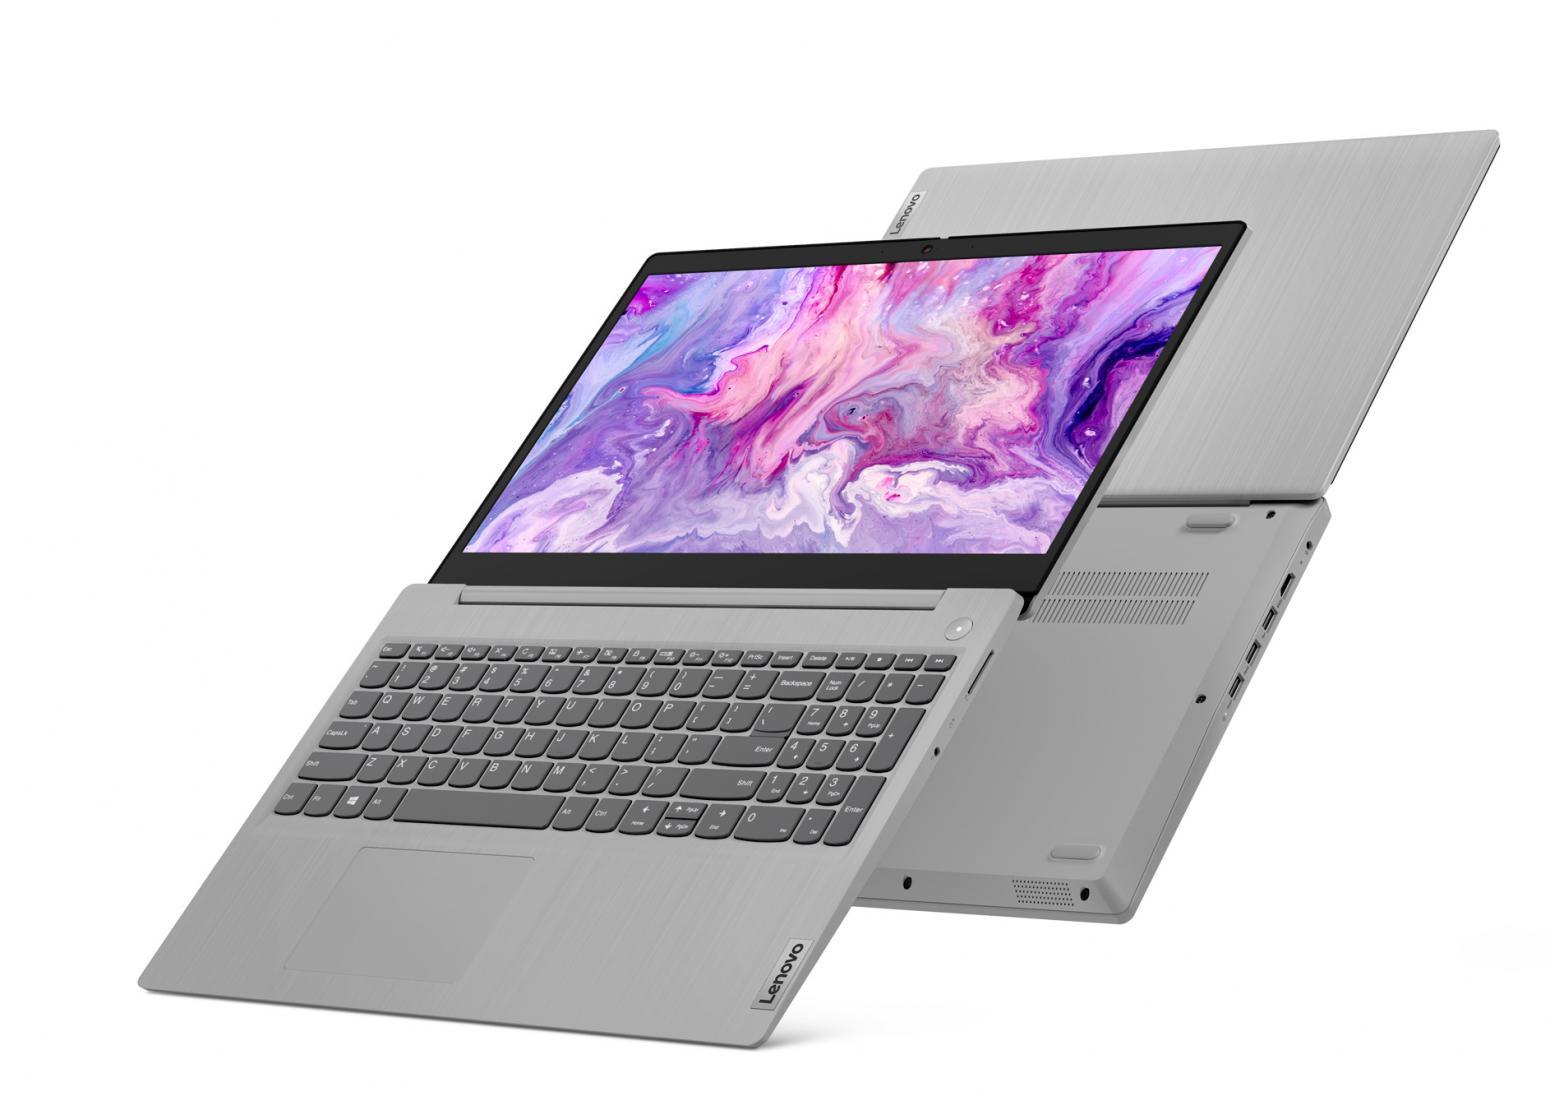 Ordinateur portable Lenovo IdeaPad 3 15ADA05 (81W10028FR) Argent - photo 6